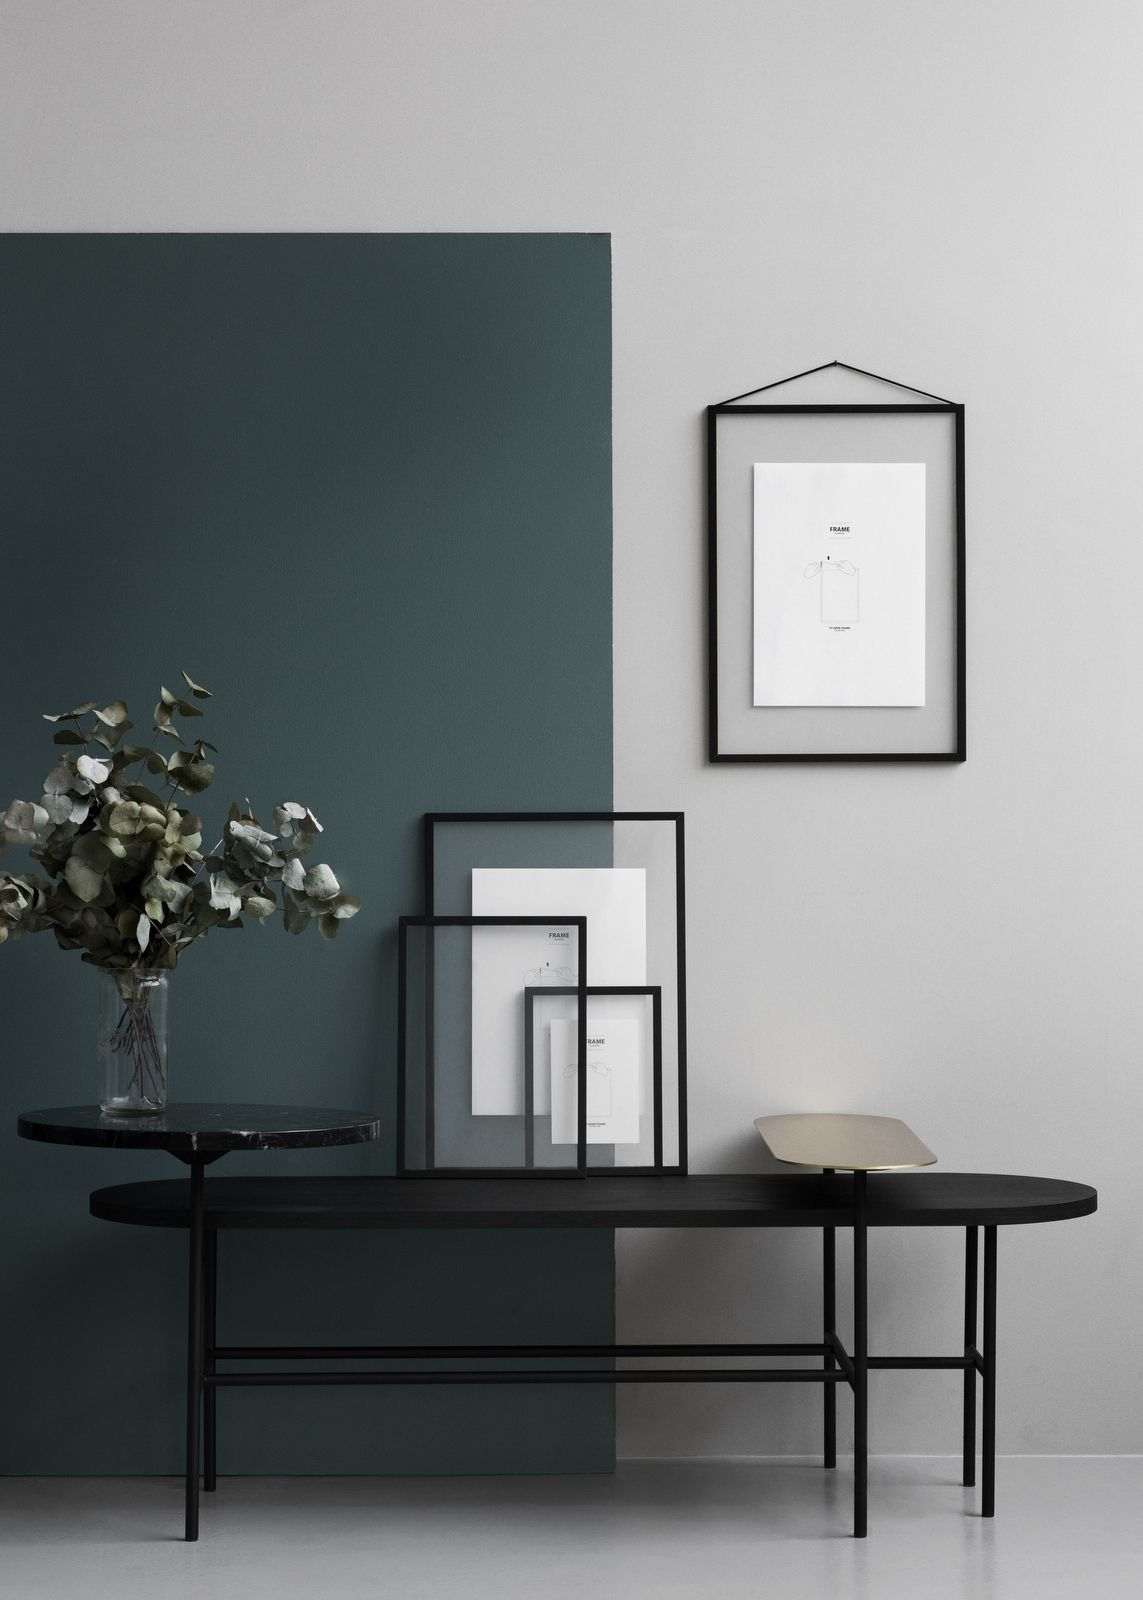 Kleine esszimmer ideen grau kährs  wood flooring  parquet  interior  design  kahrs